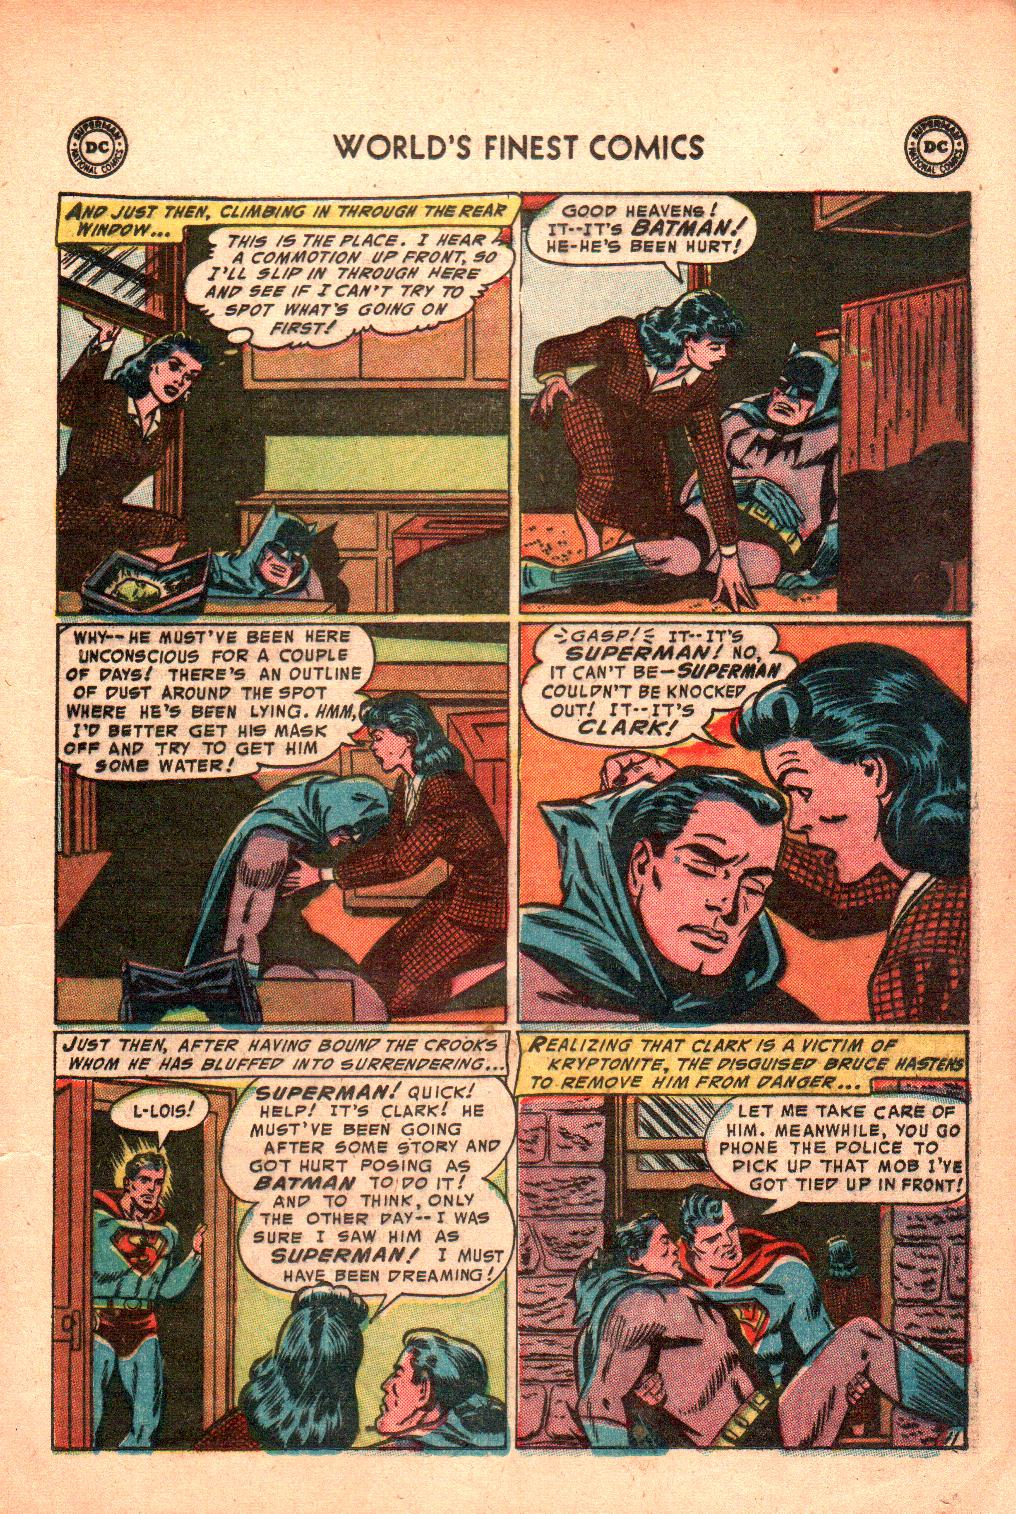 Read online World's Finest Comics comic -  Issue #71 - 15